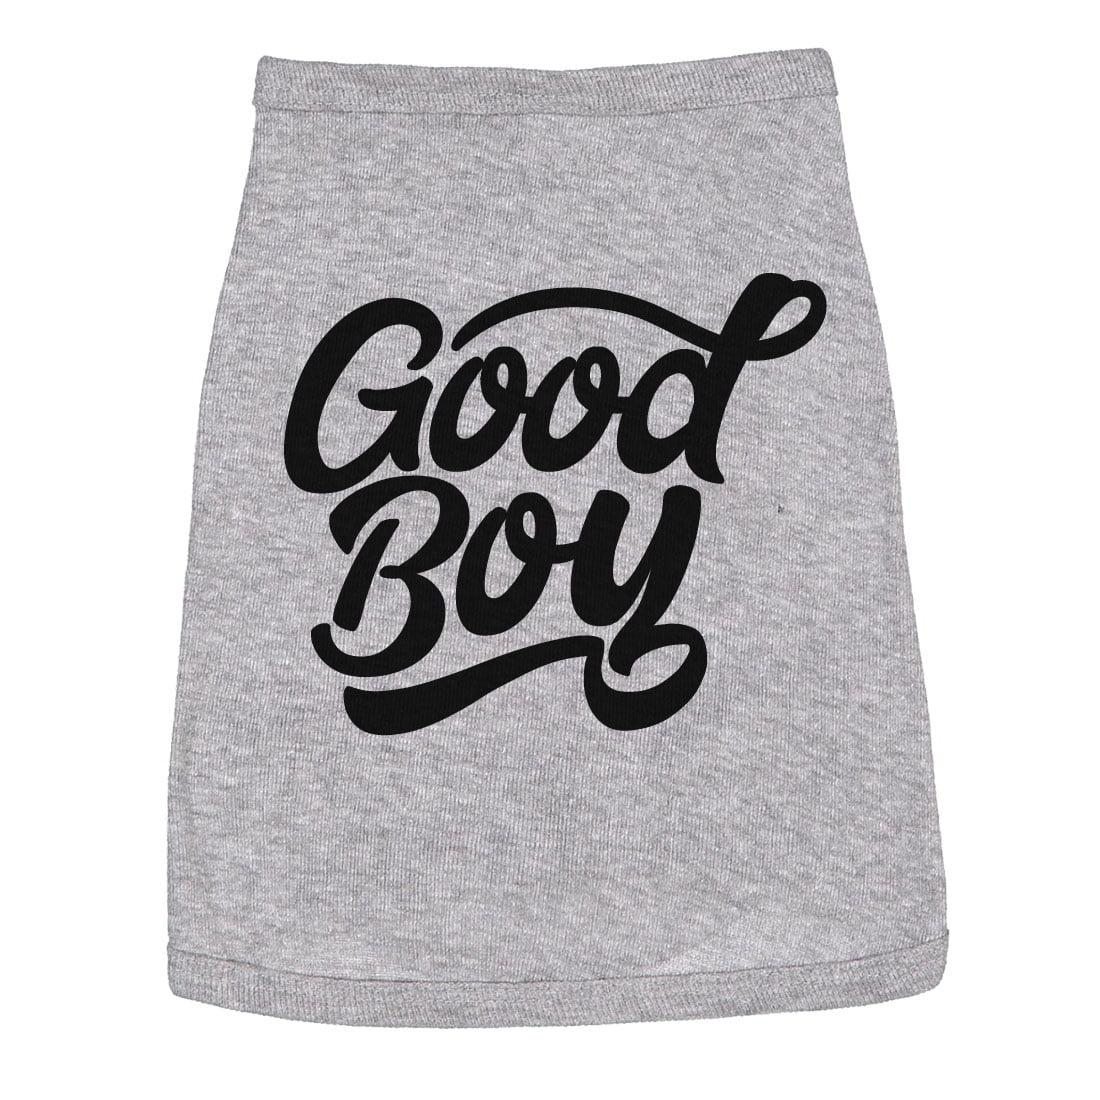 Dog Shirt Good Boy Cute Clothes For Family Pet